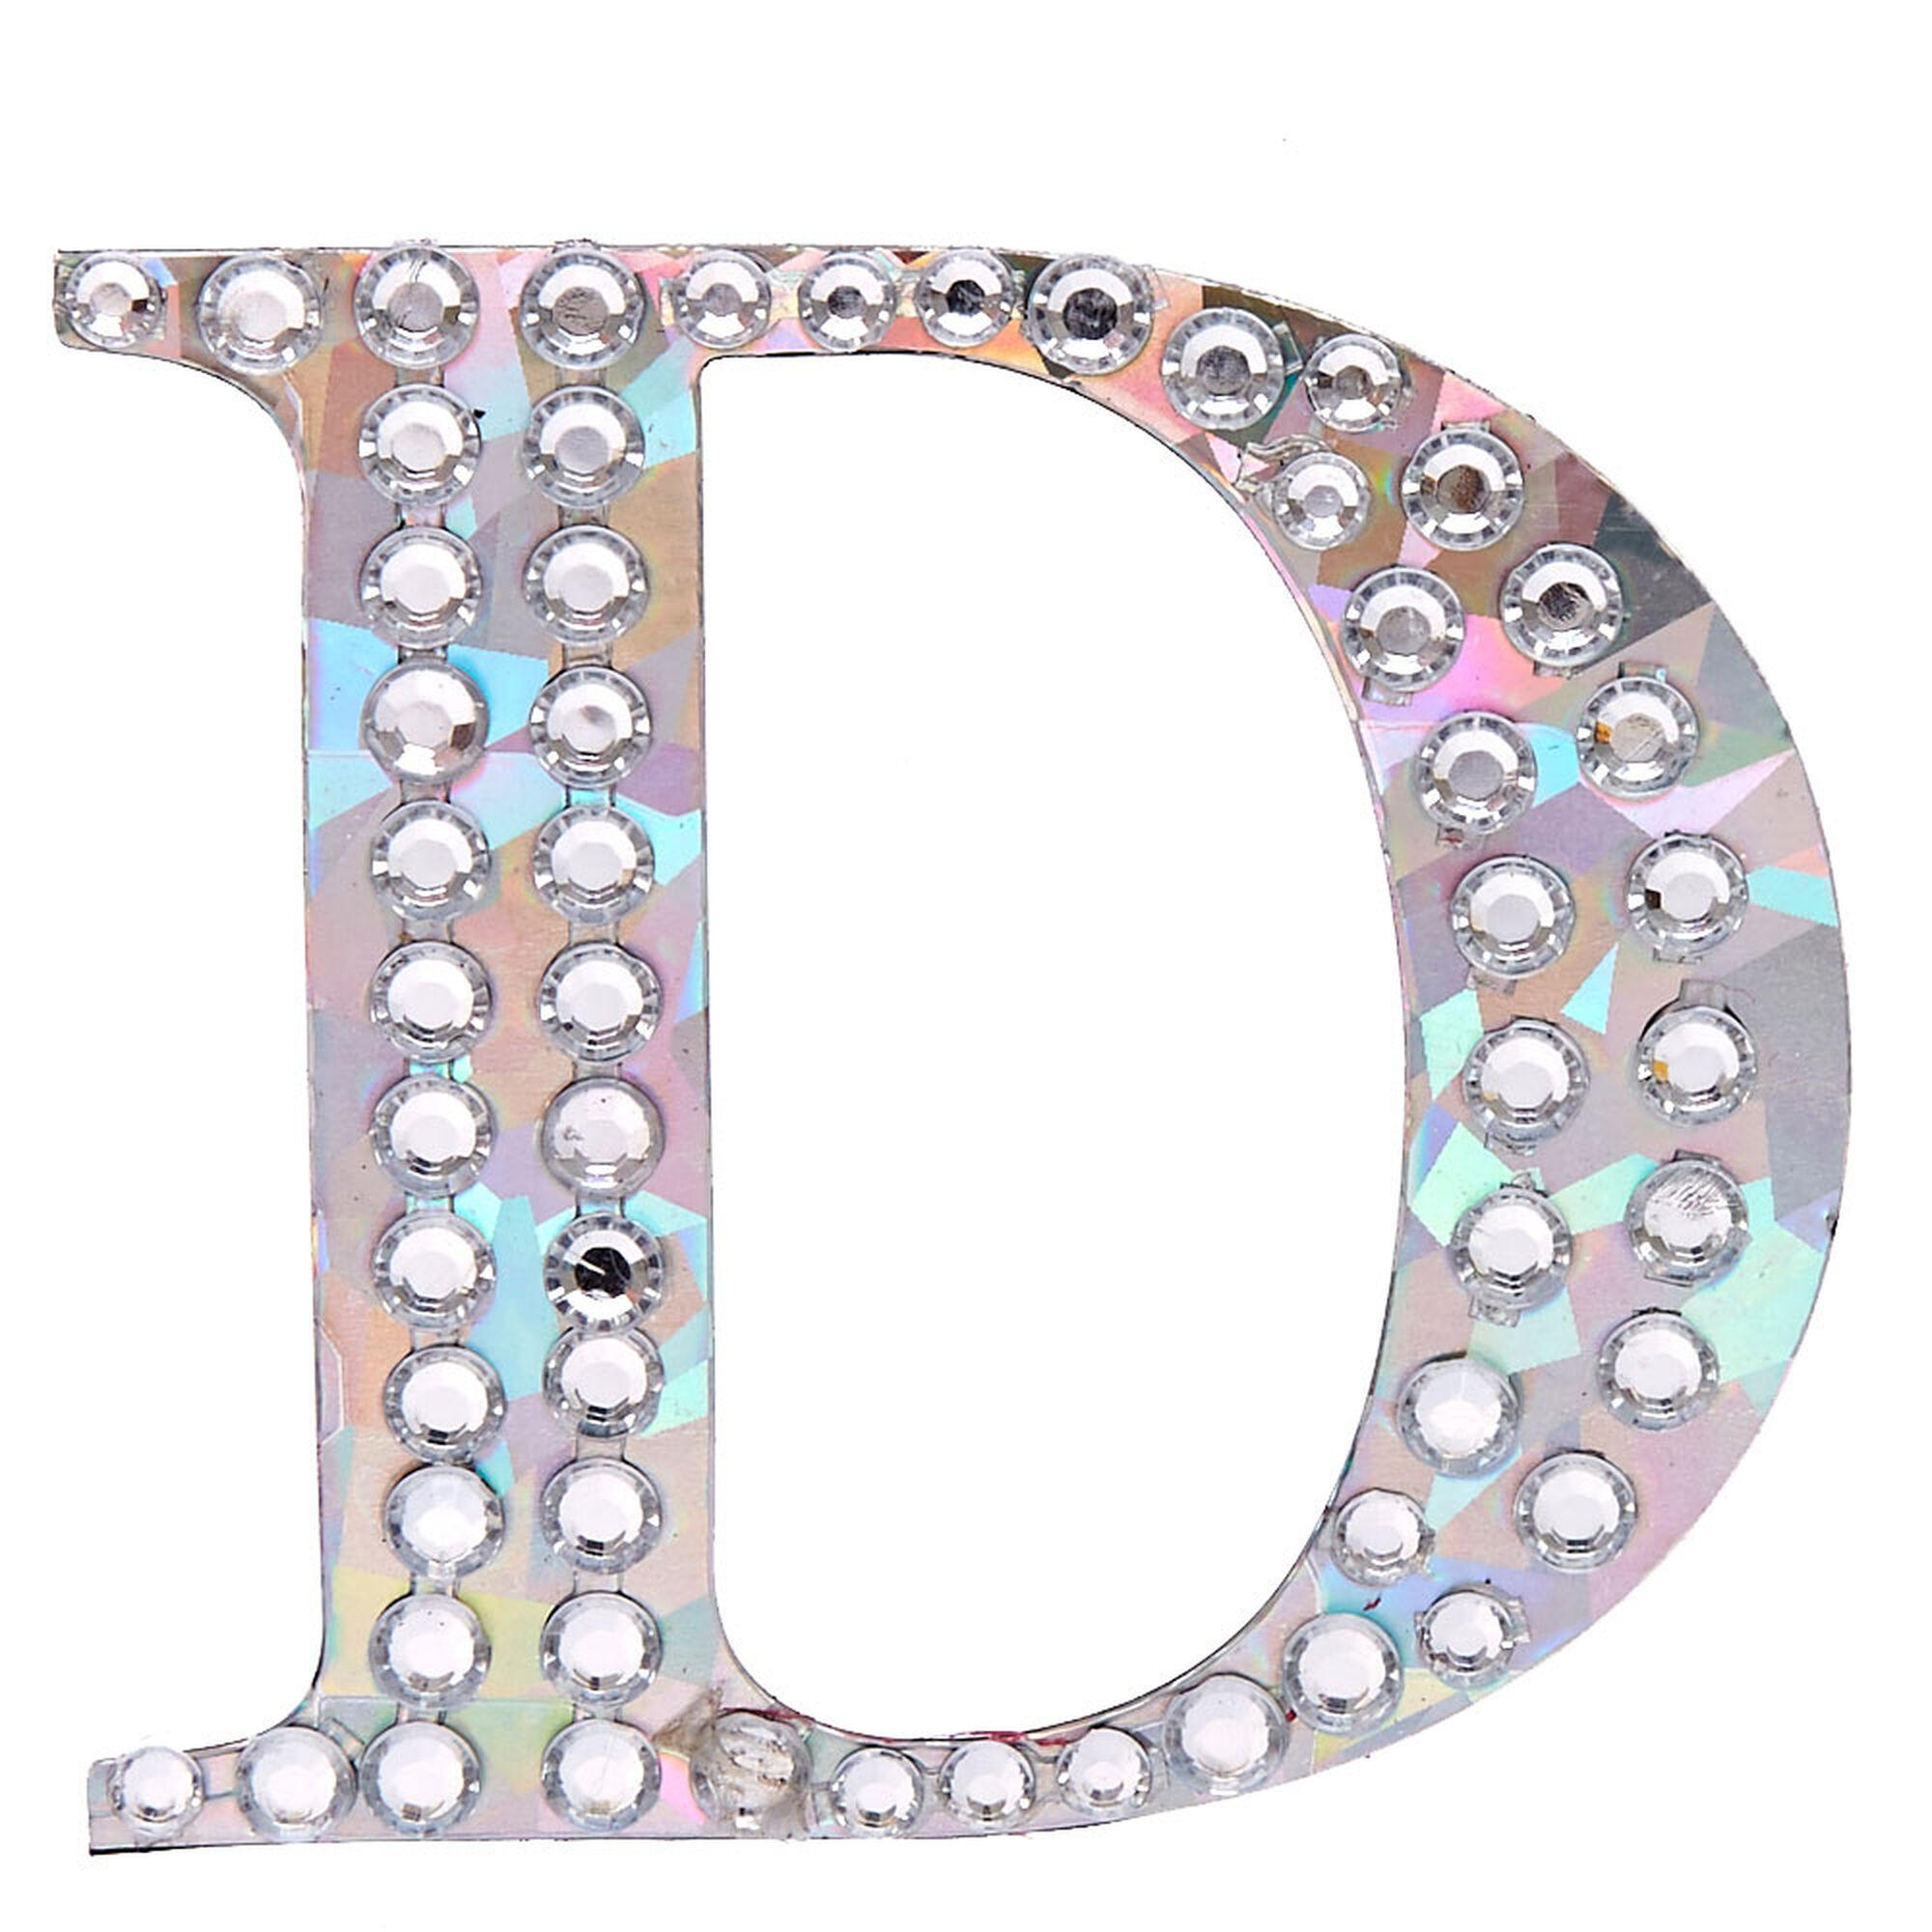 Holographic peel stick letter d magnet claires us holographic peel amp stick letter d jeuxipadfo Images